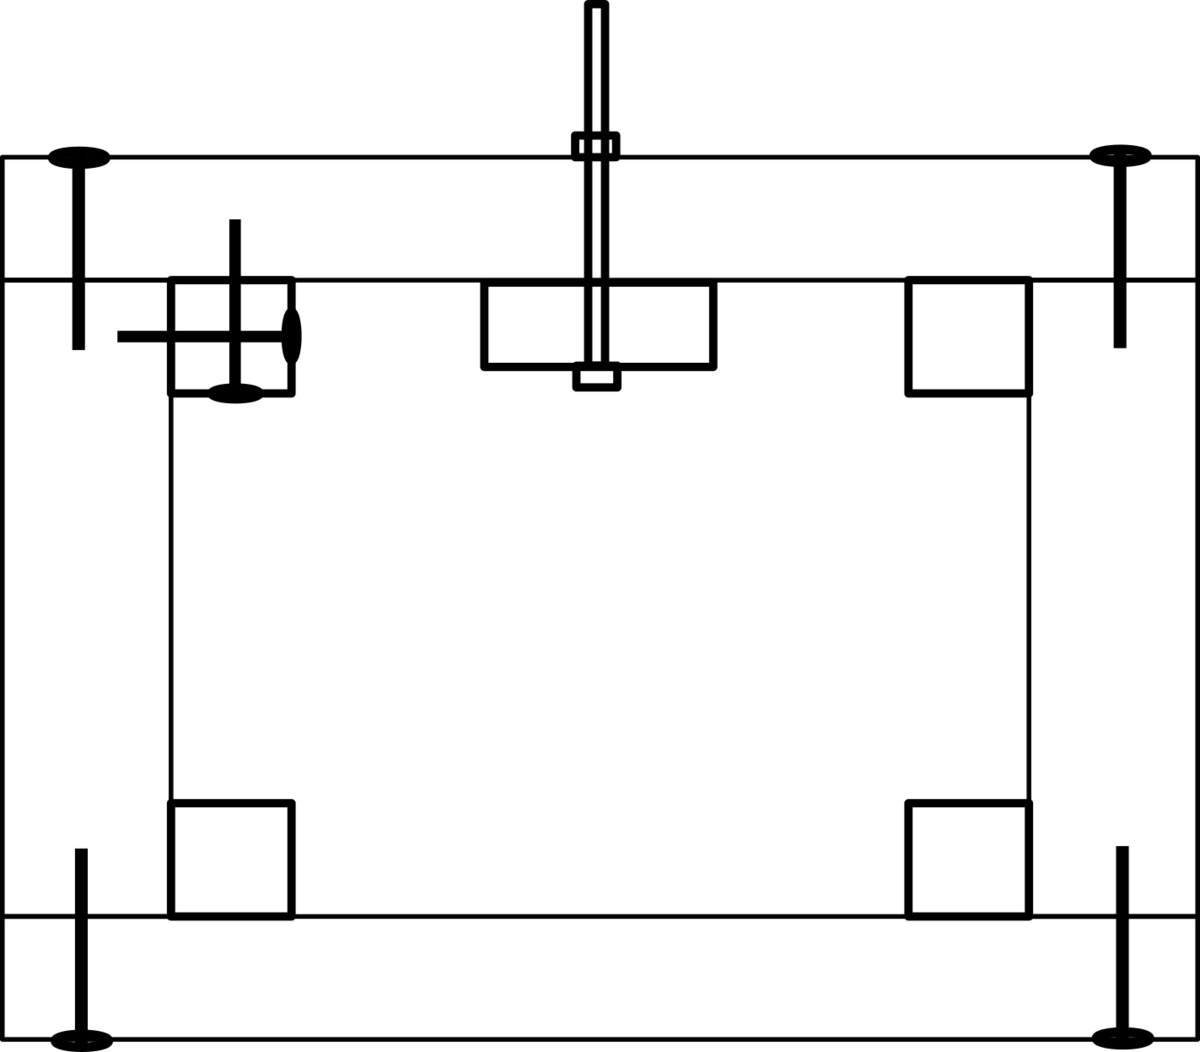 f:id:shimotaro3:20201127184835p:plain